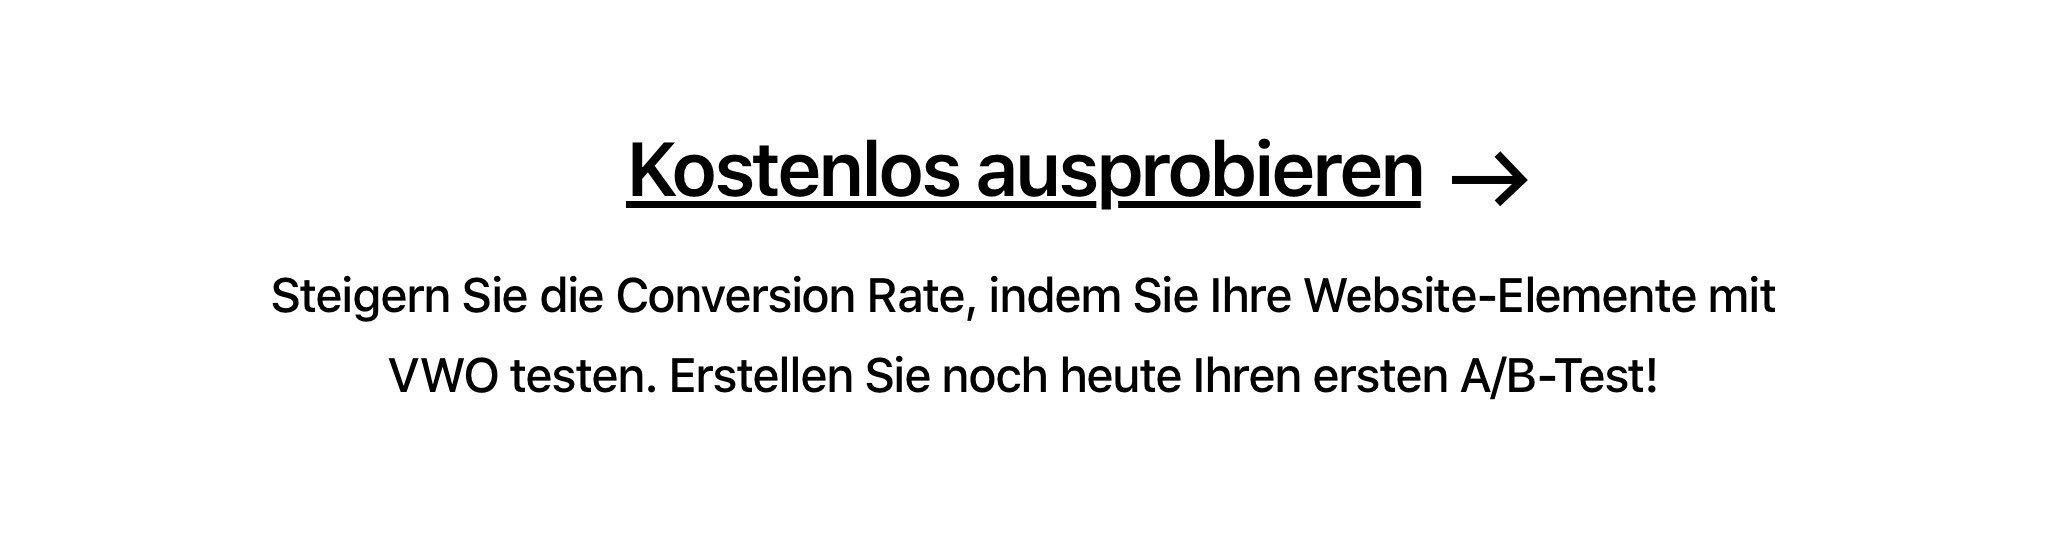 Ab Testing Guide German Banner 5